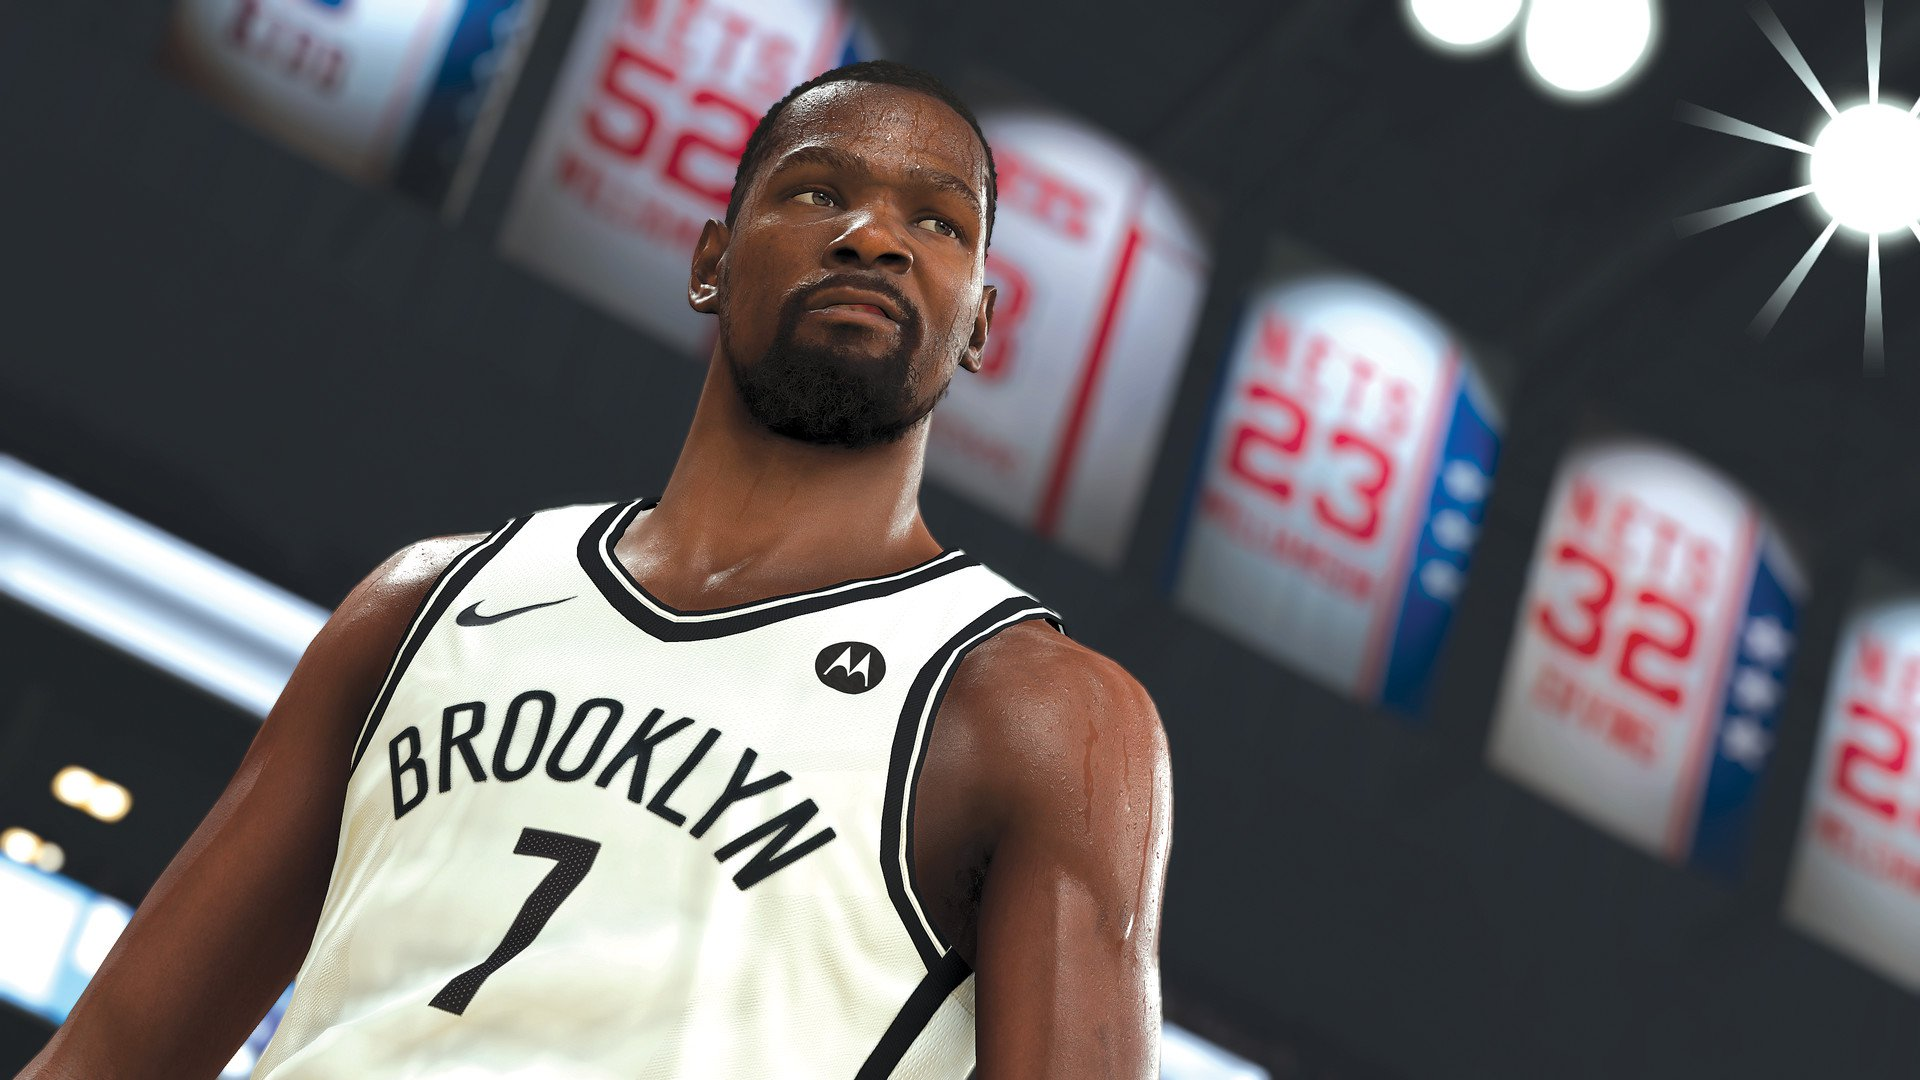 2K22 NBA 75th Anniversary Edition 1